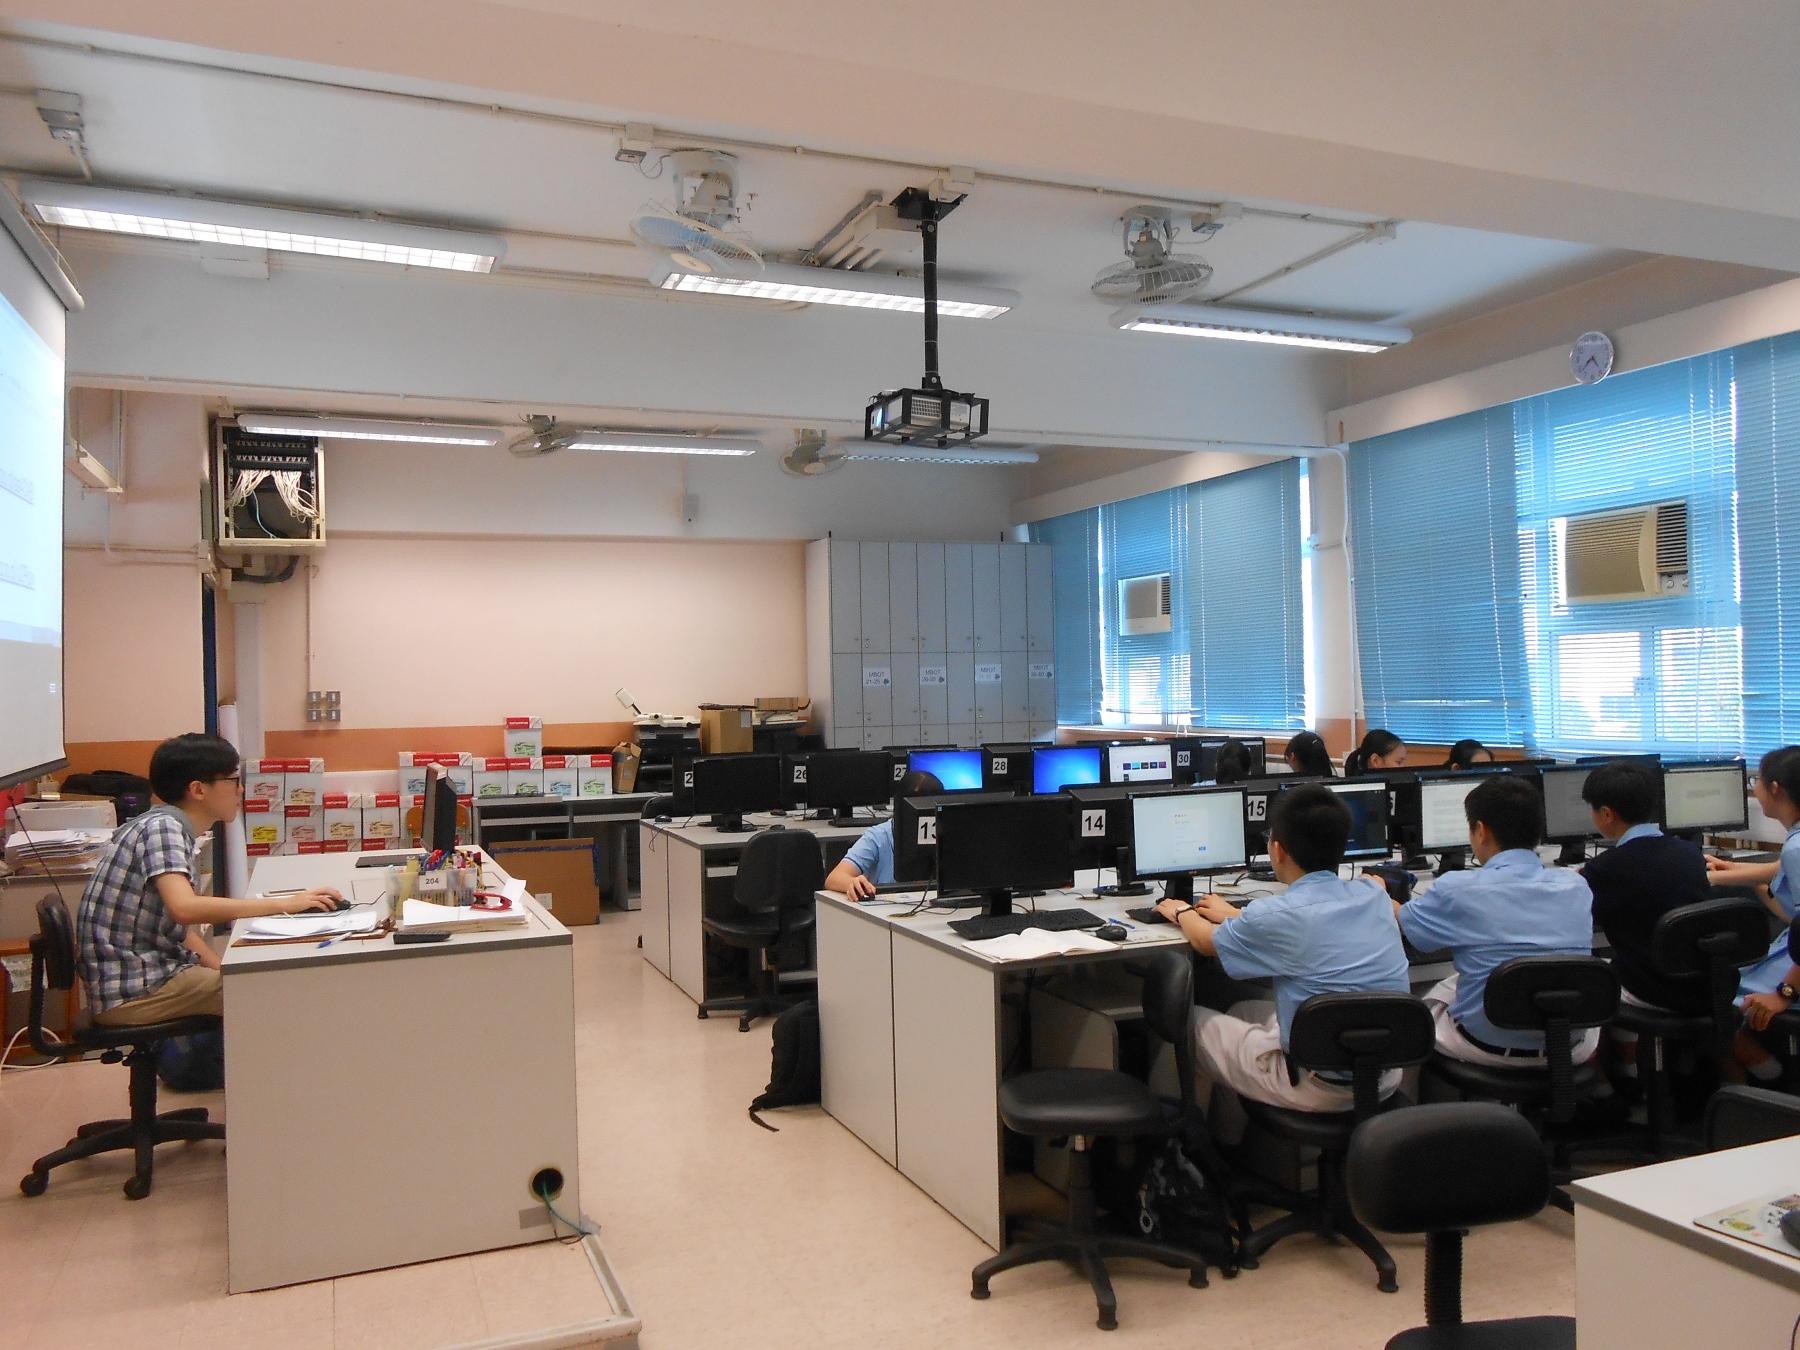 http://npc.edu.hk/sites/default/files/dscn0143.jpg